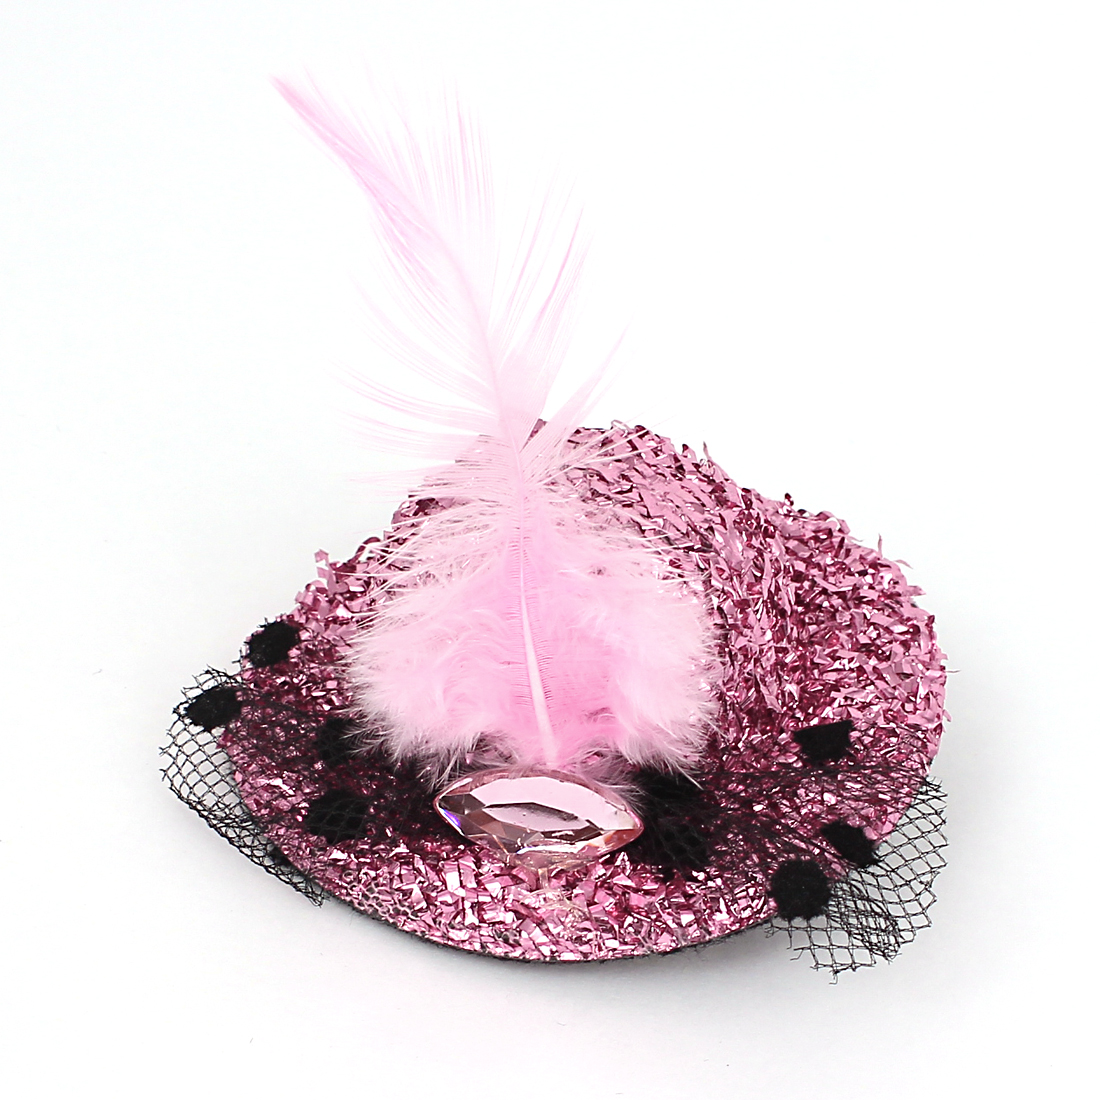 Lady Rhinestone Inlaid Feather Decor Glitter Tinsel Cover Mini Top Cap Alligator Clip Hairclip Pink